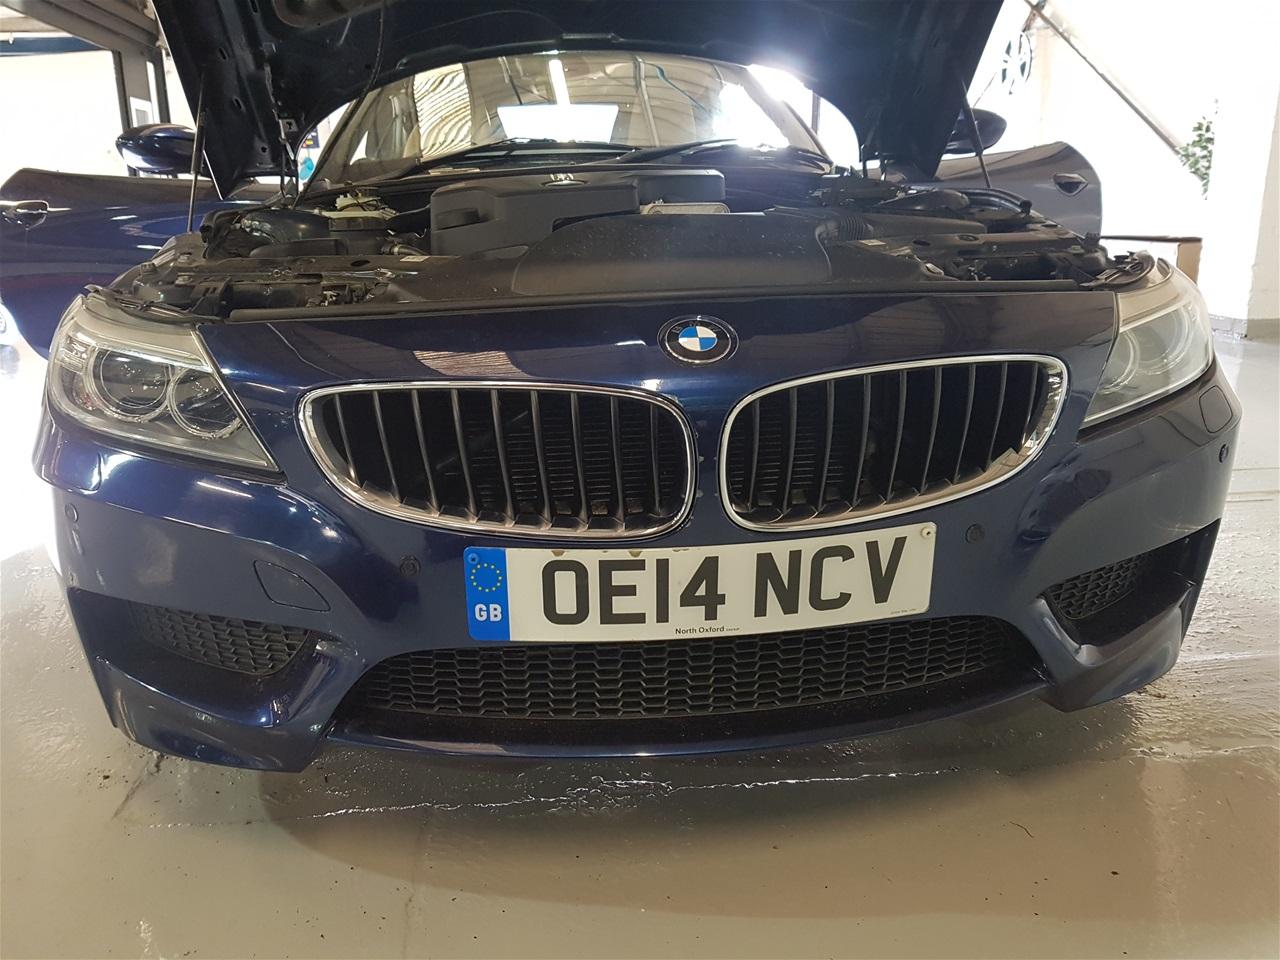 BMW Z4 front colour coded parking sensors